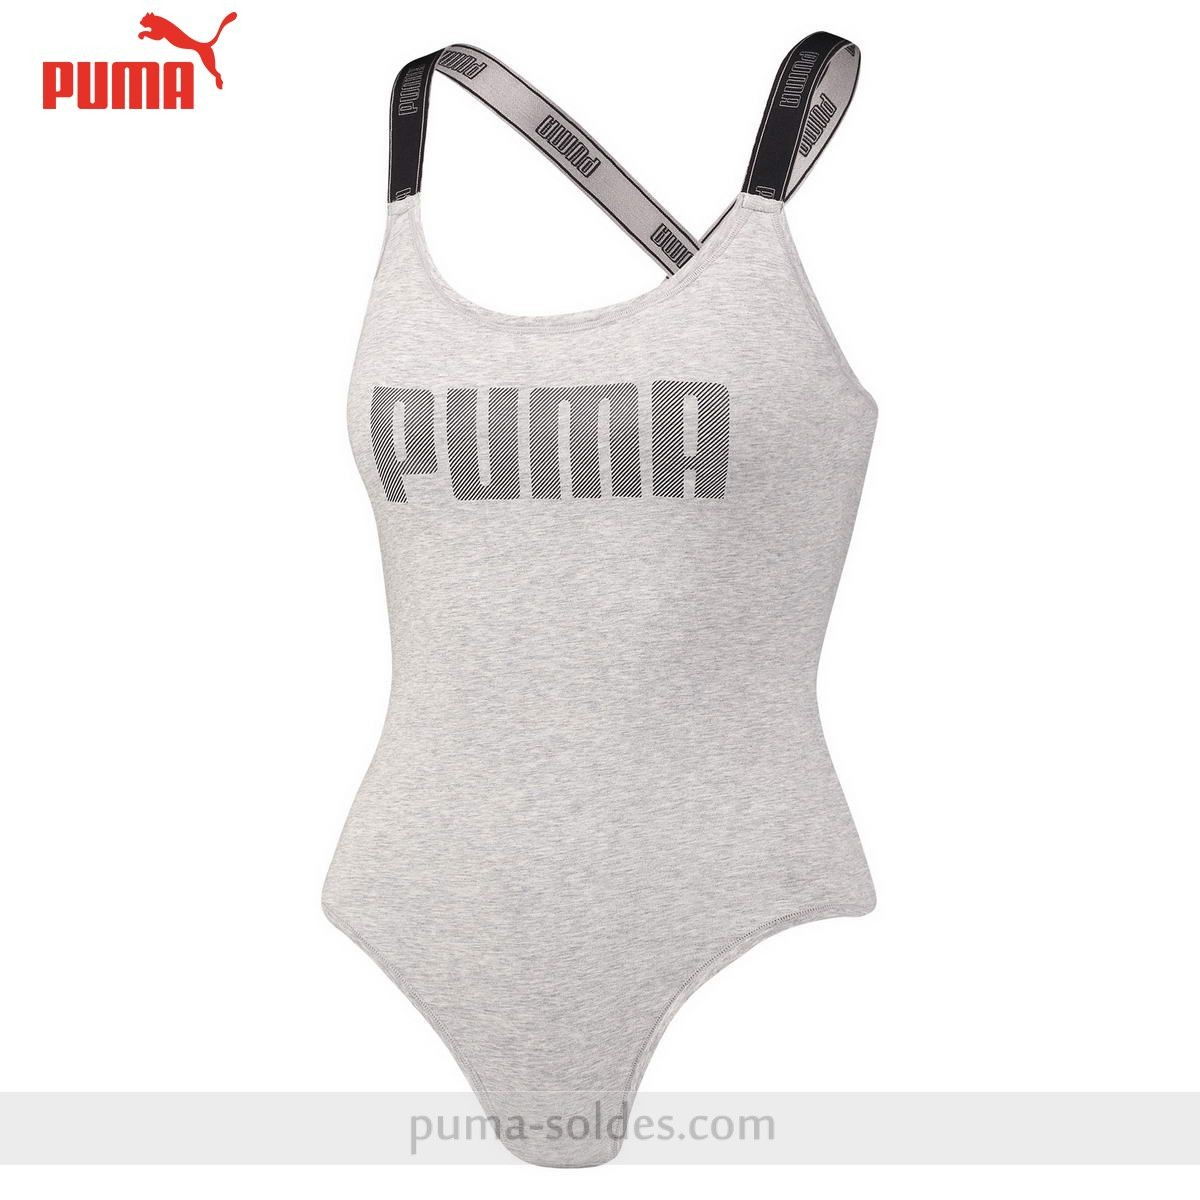 body puma femme